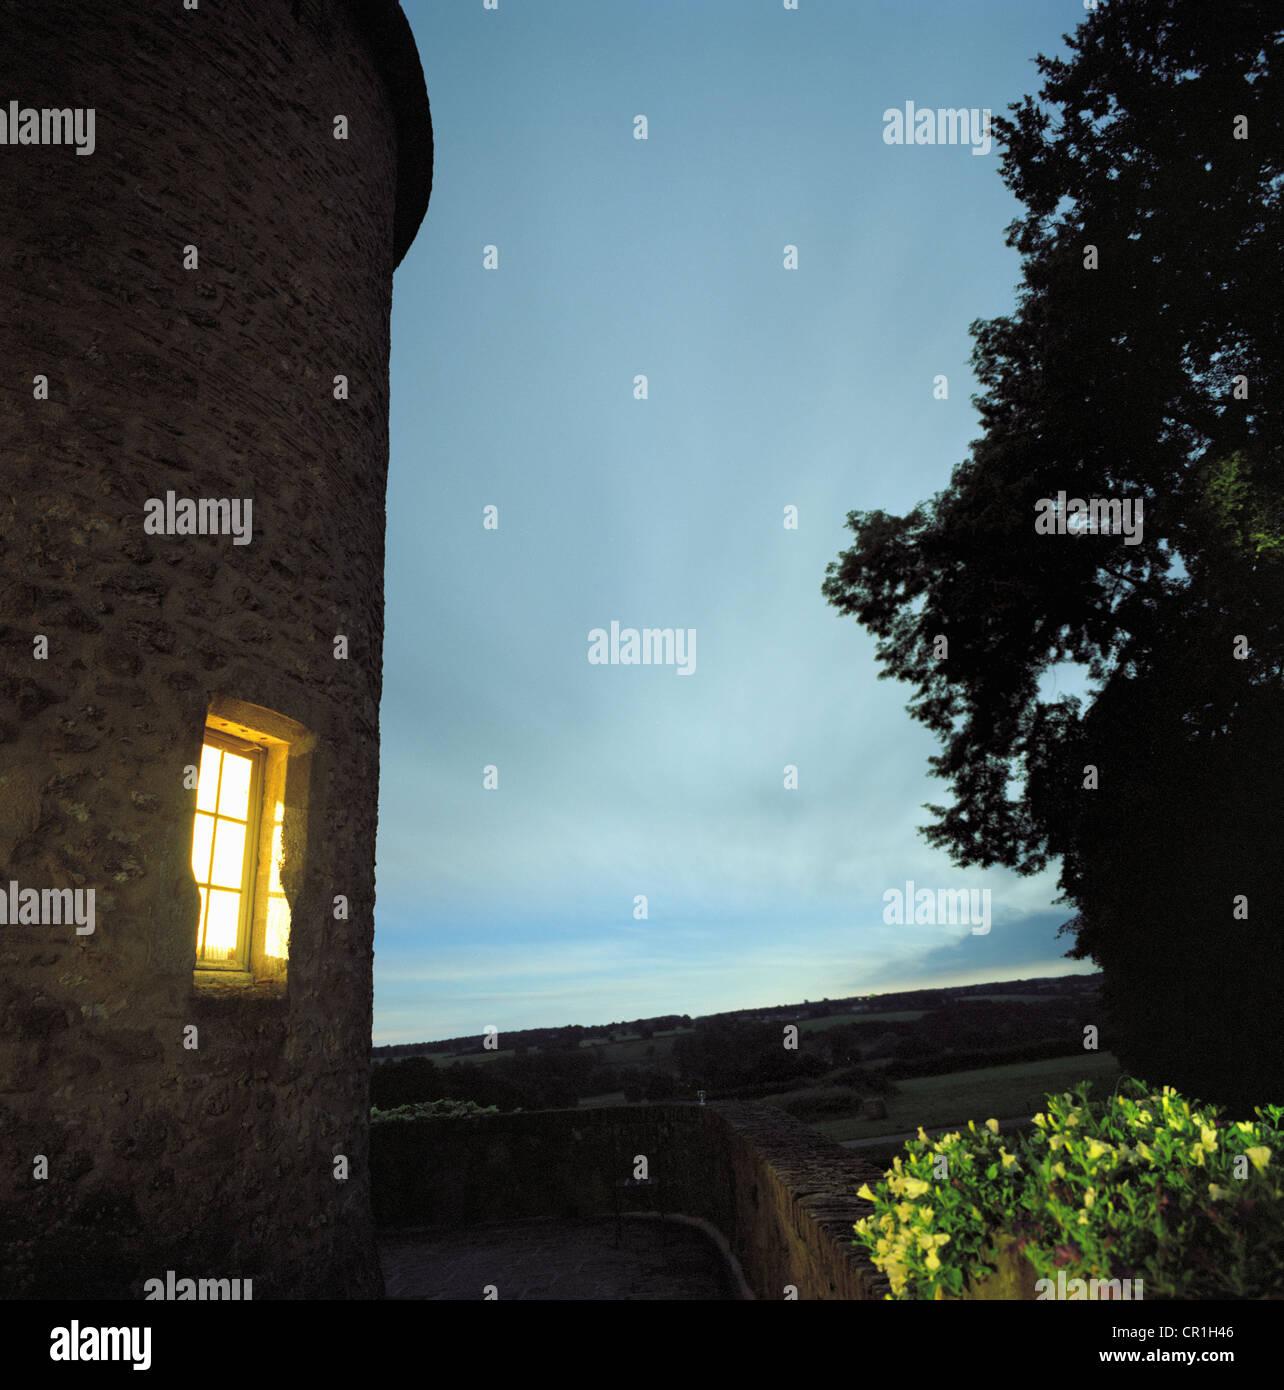 Lit window of stone house - Stock Image